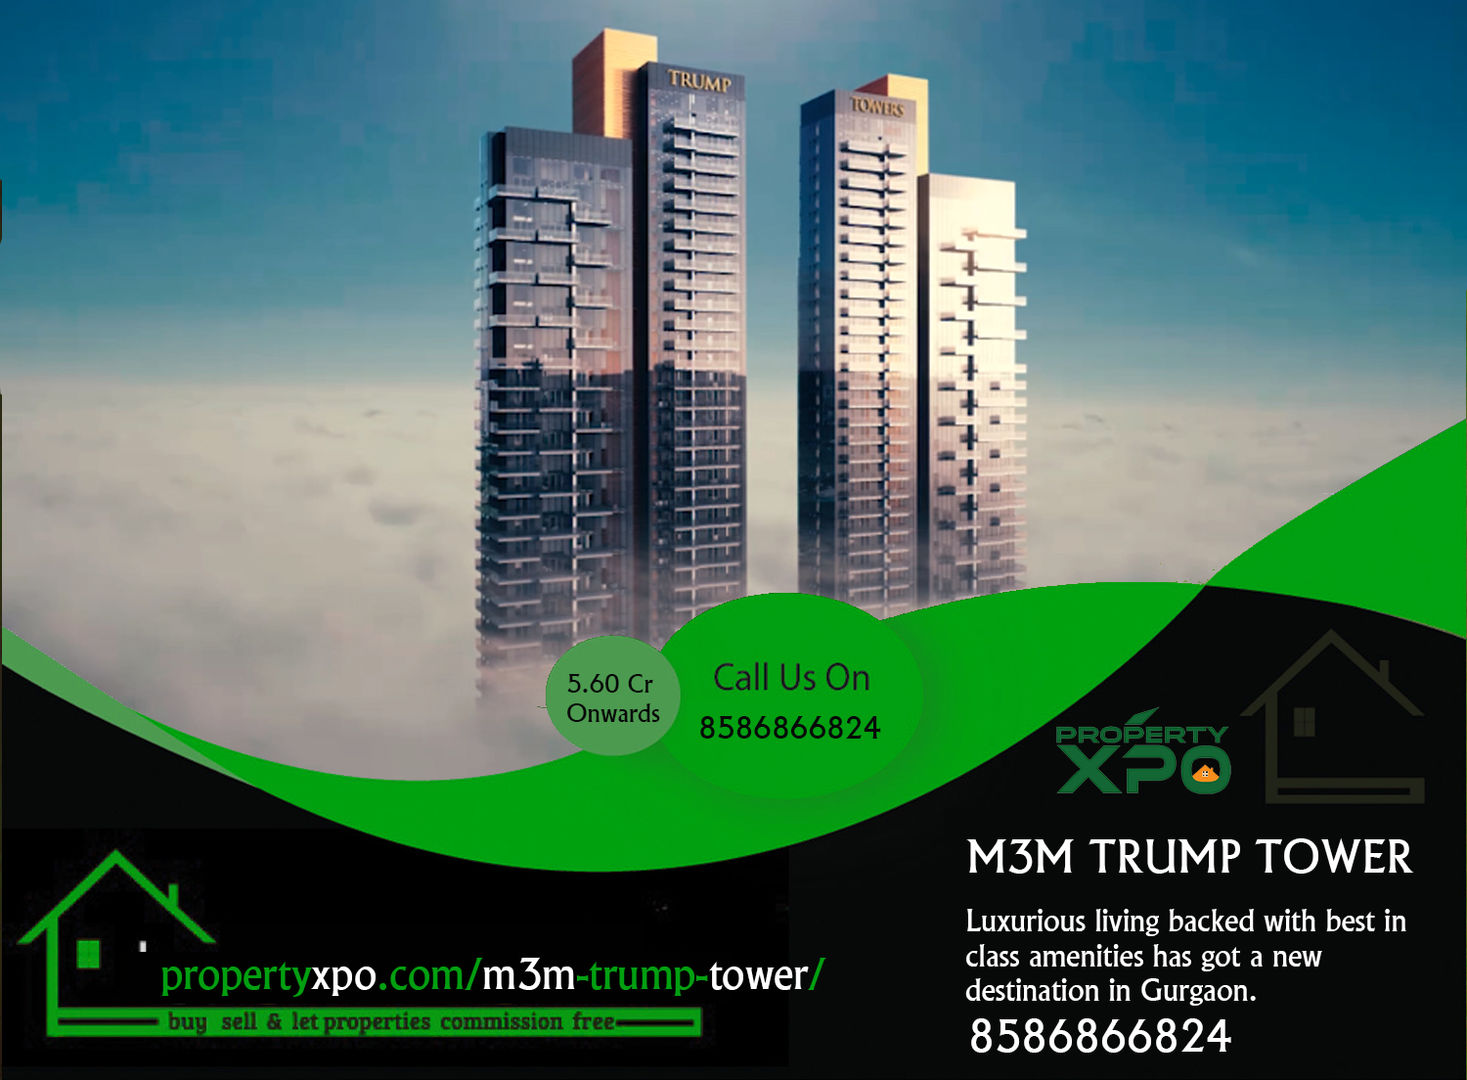 M3M Trump Tower